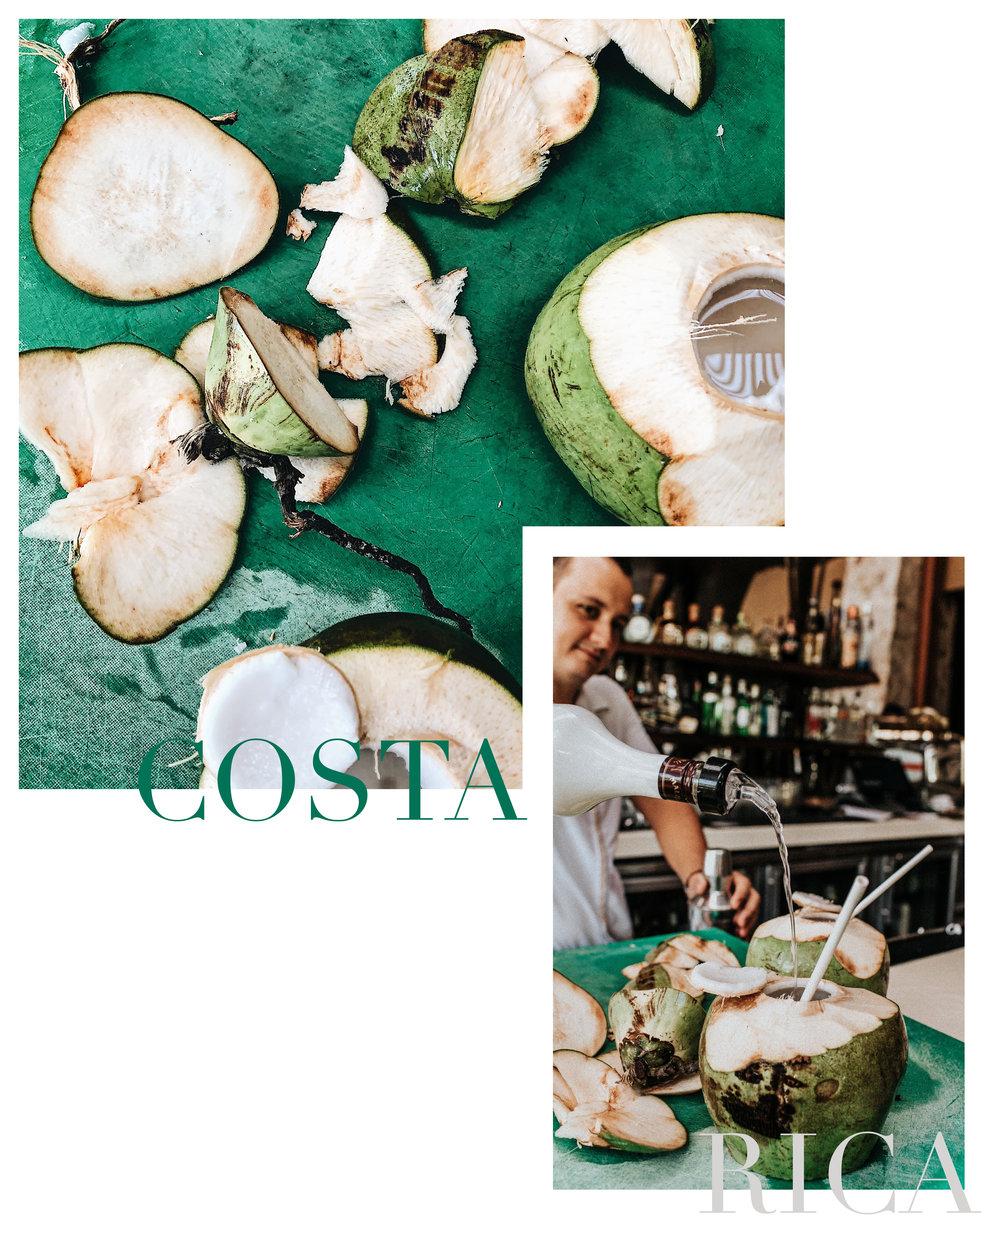 Costa Rico_3.jpg